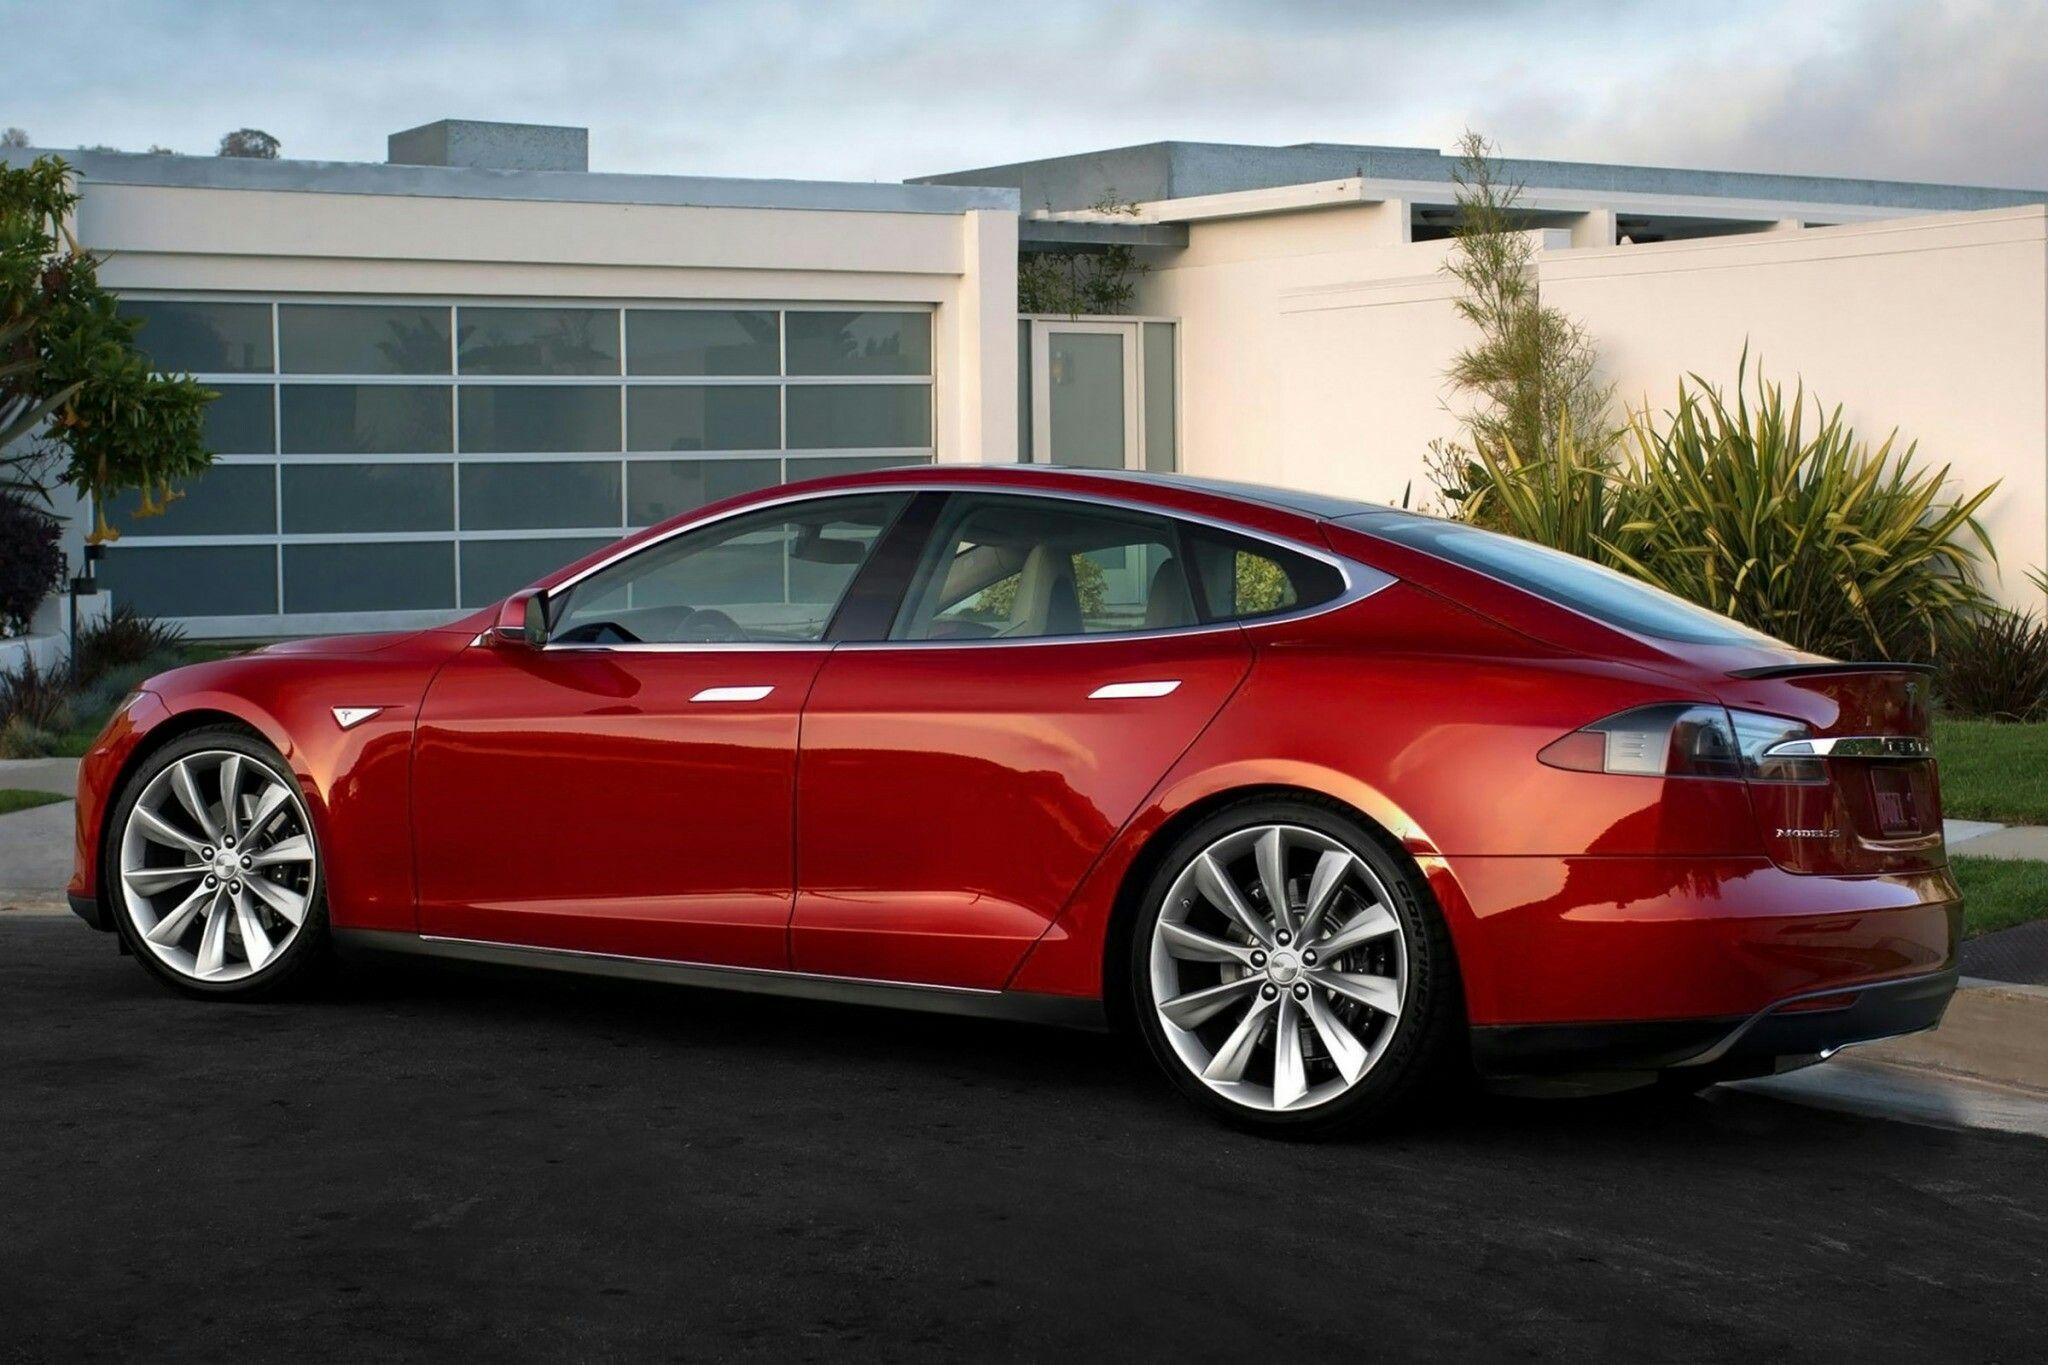 All electric cars image by Djoa Dowski on Cars Tesla